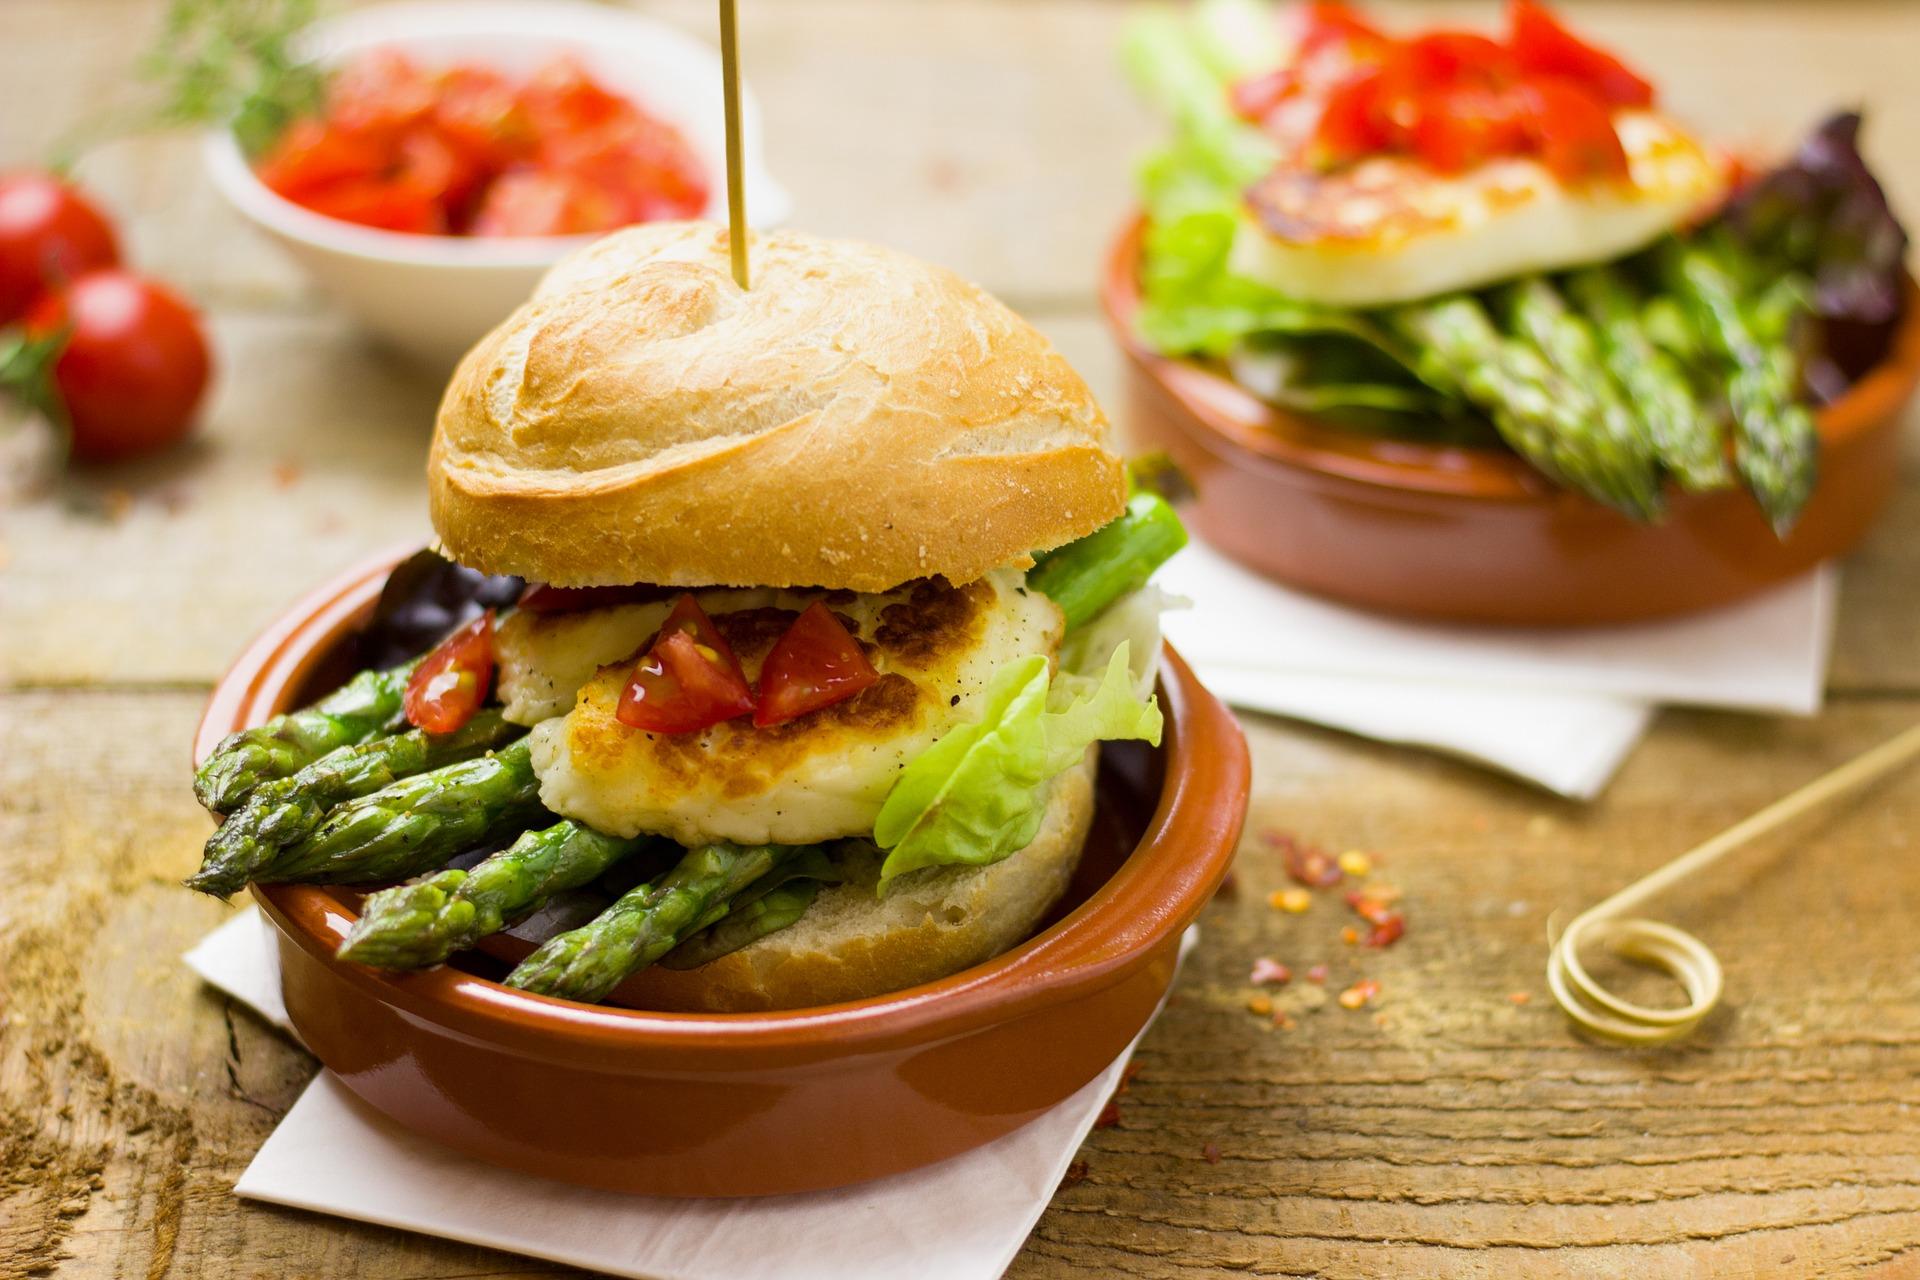 Crispy Fish Burger Recipe - Hello World Magazine